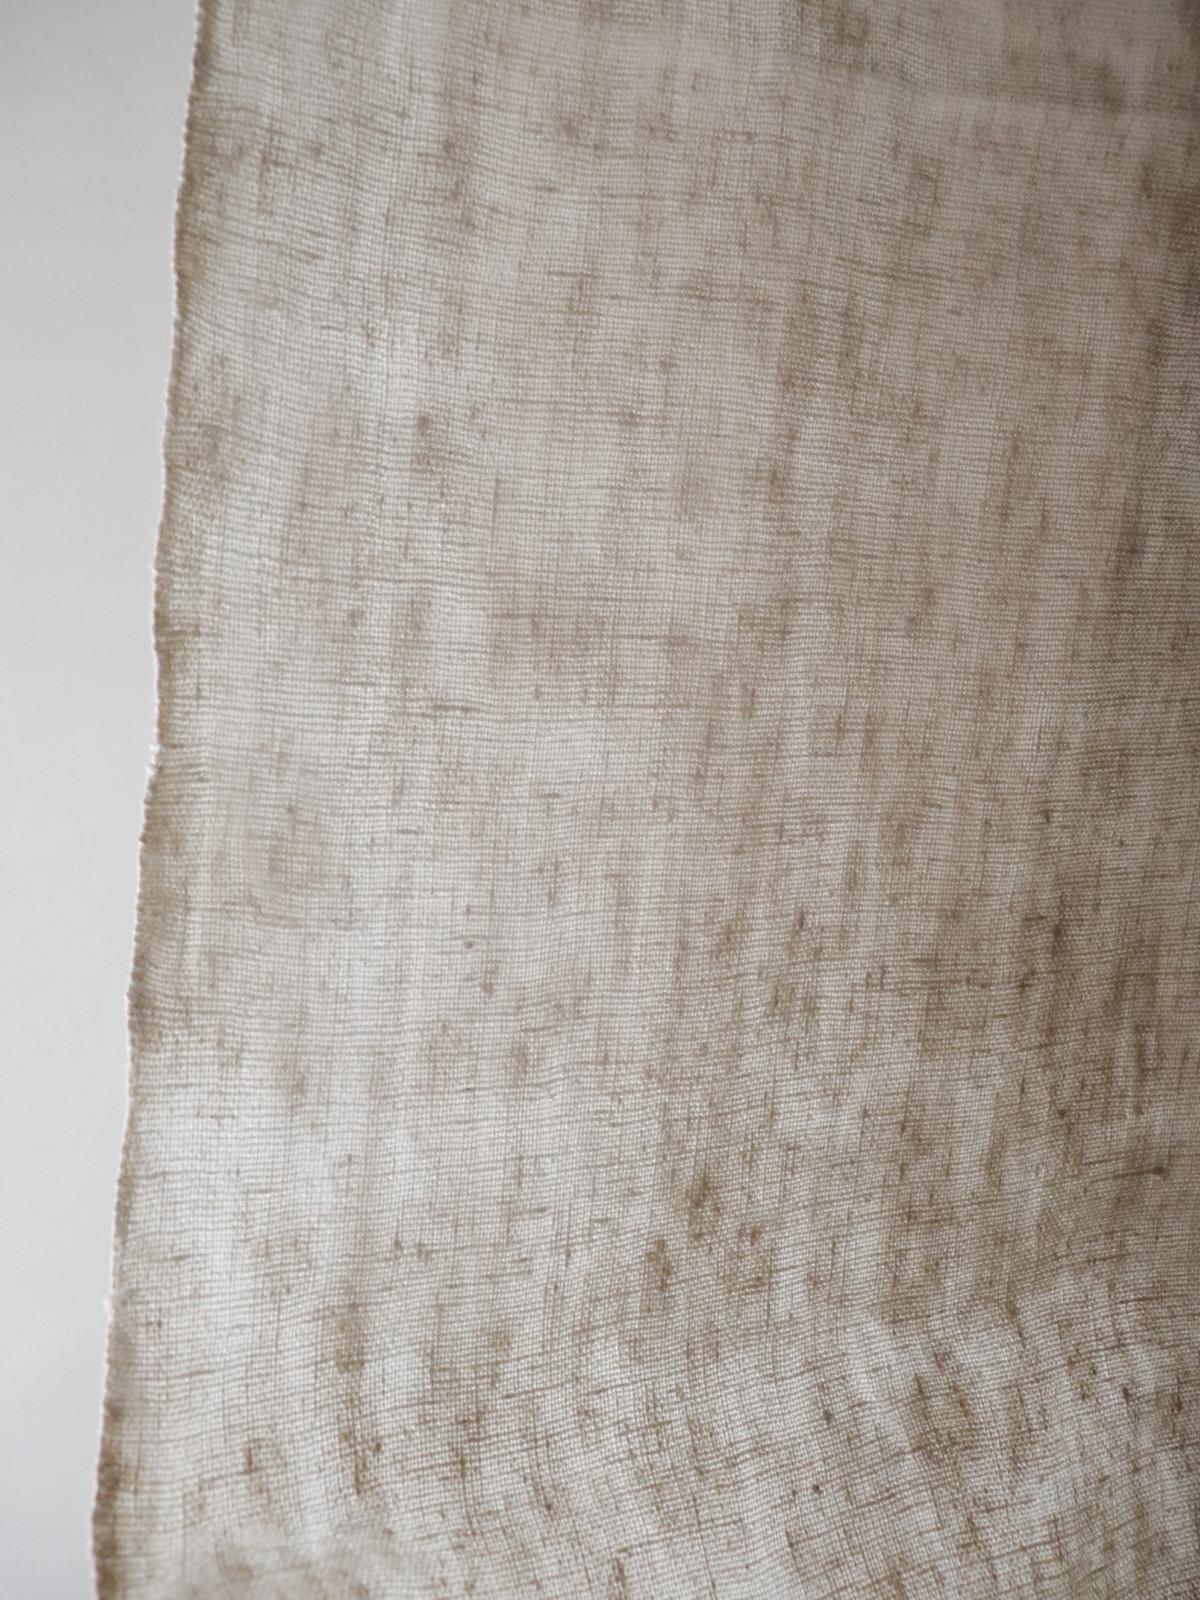 Vintage,linen,fabric,france